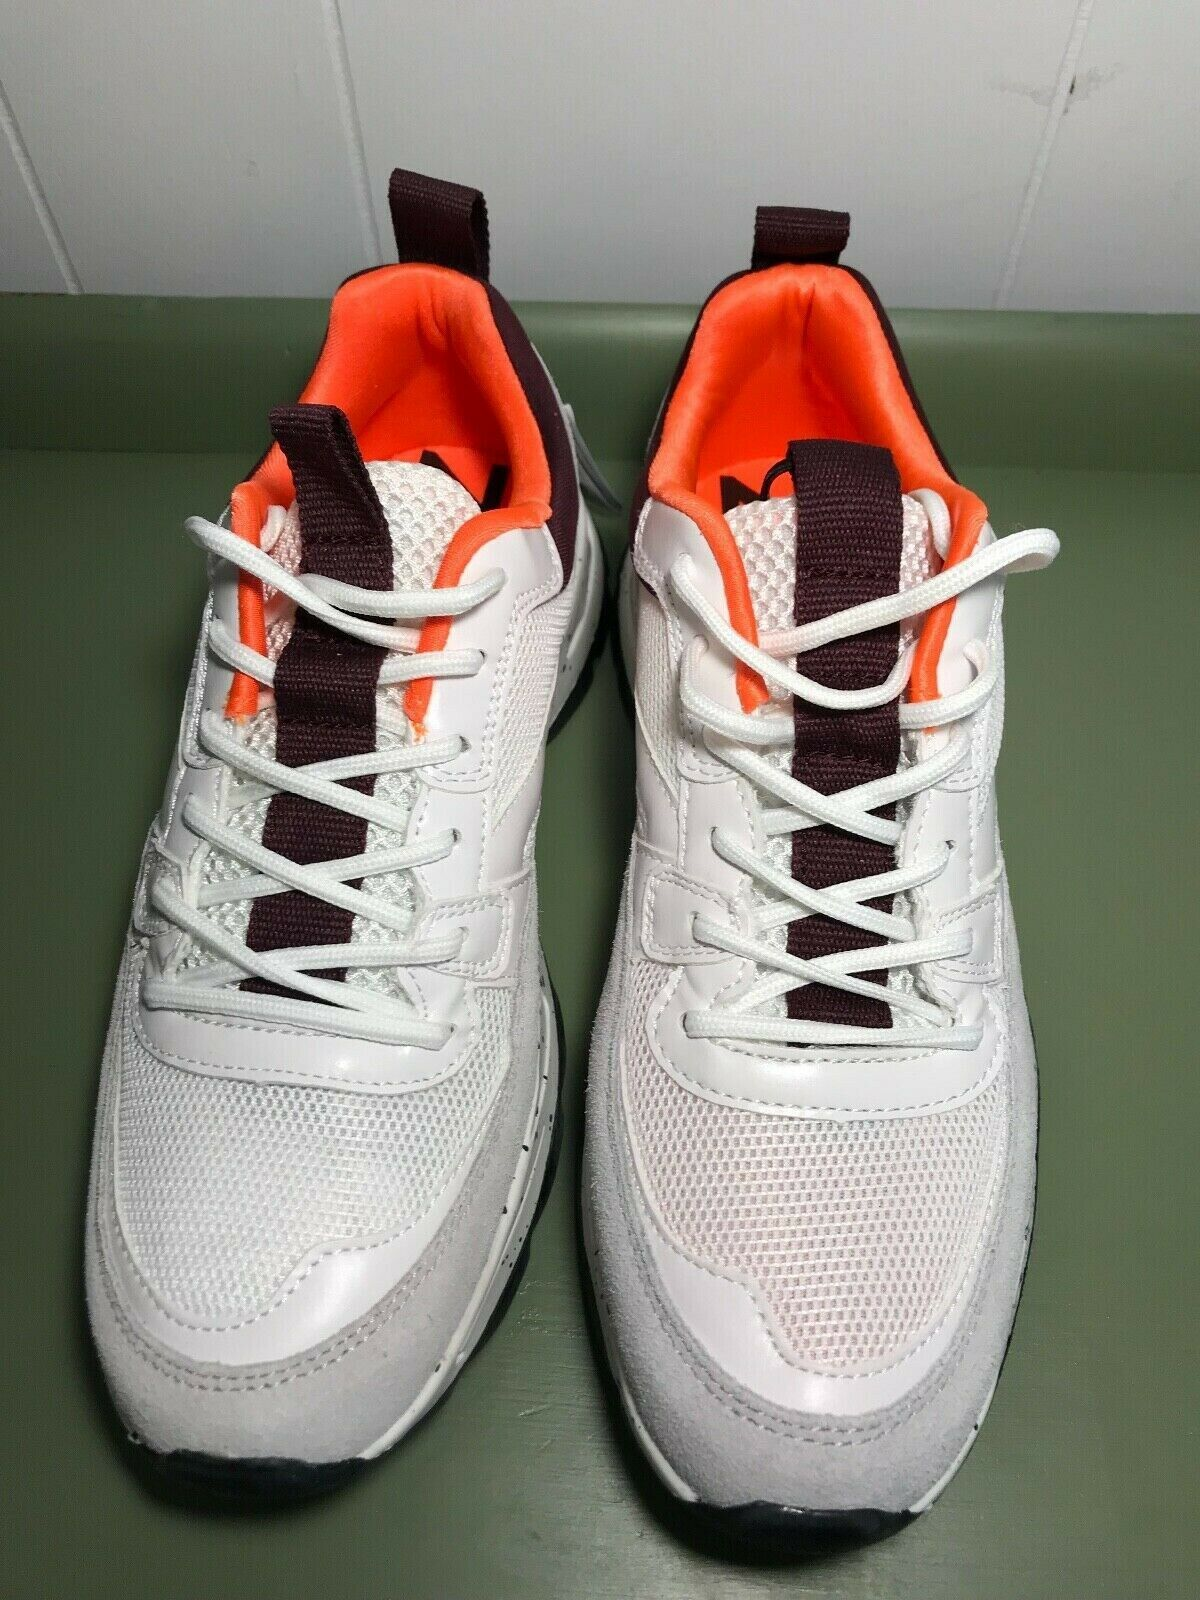 Zara Women White, Maroon and Neon orange Trainer Sneaker US Size 8 BRAND NEW